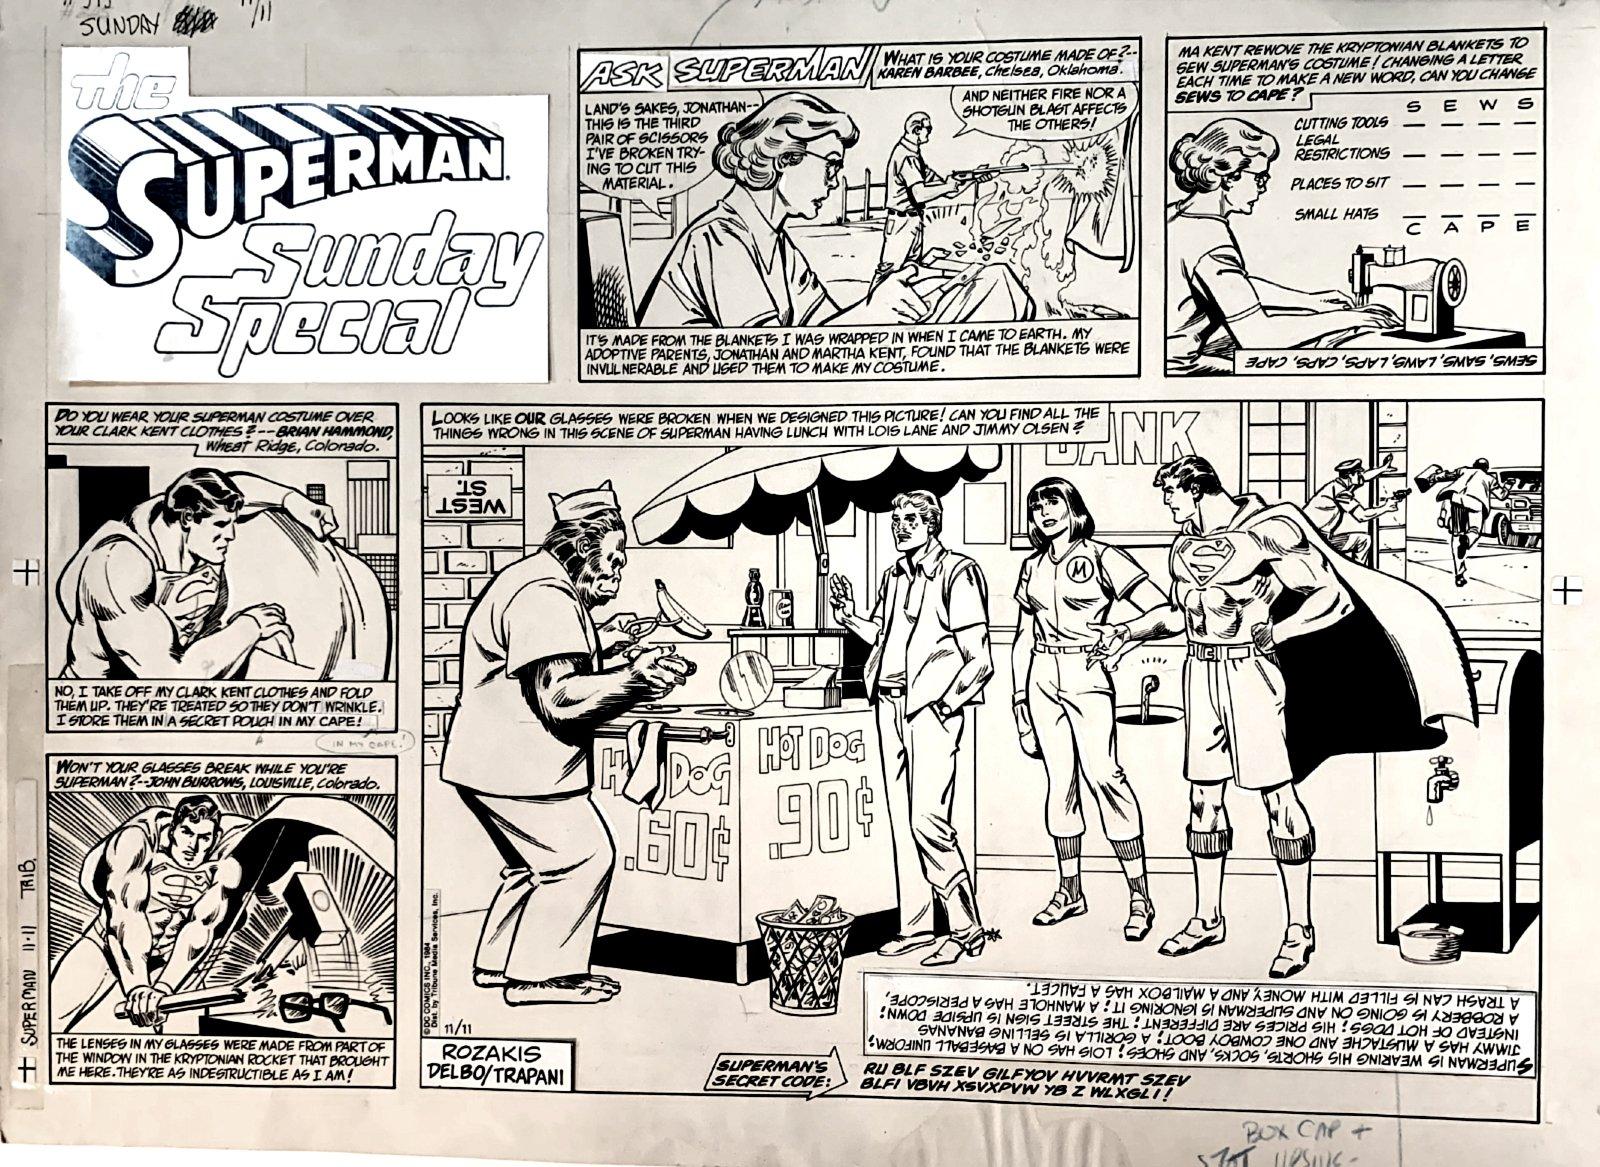 Superman Sunday Comic Strip November 11, 1984 (Very Large)